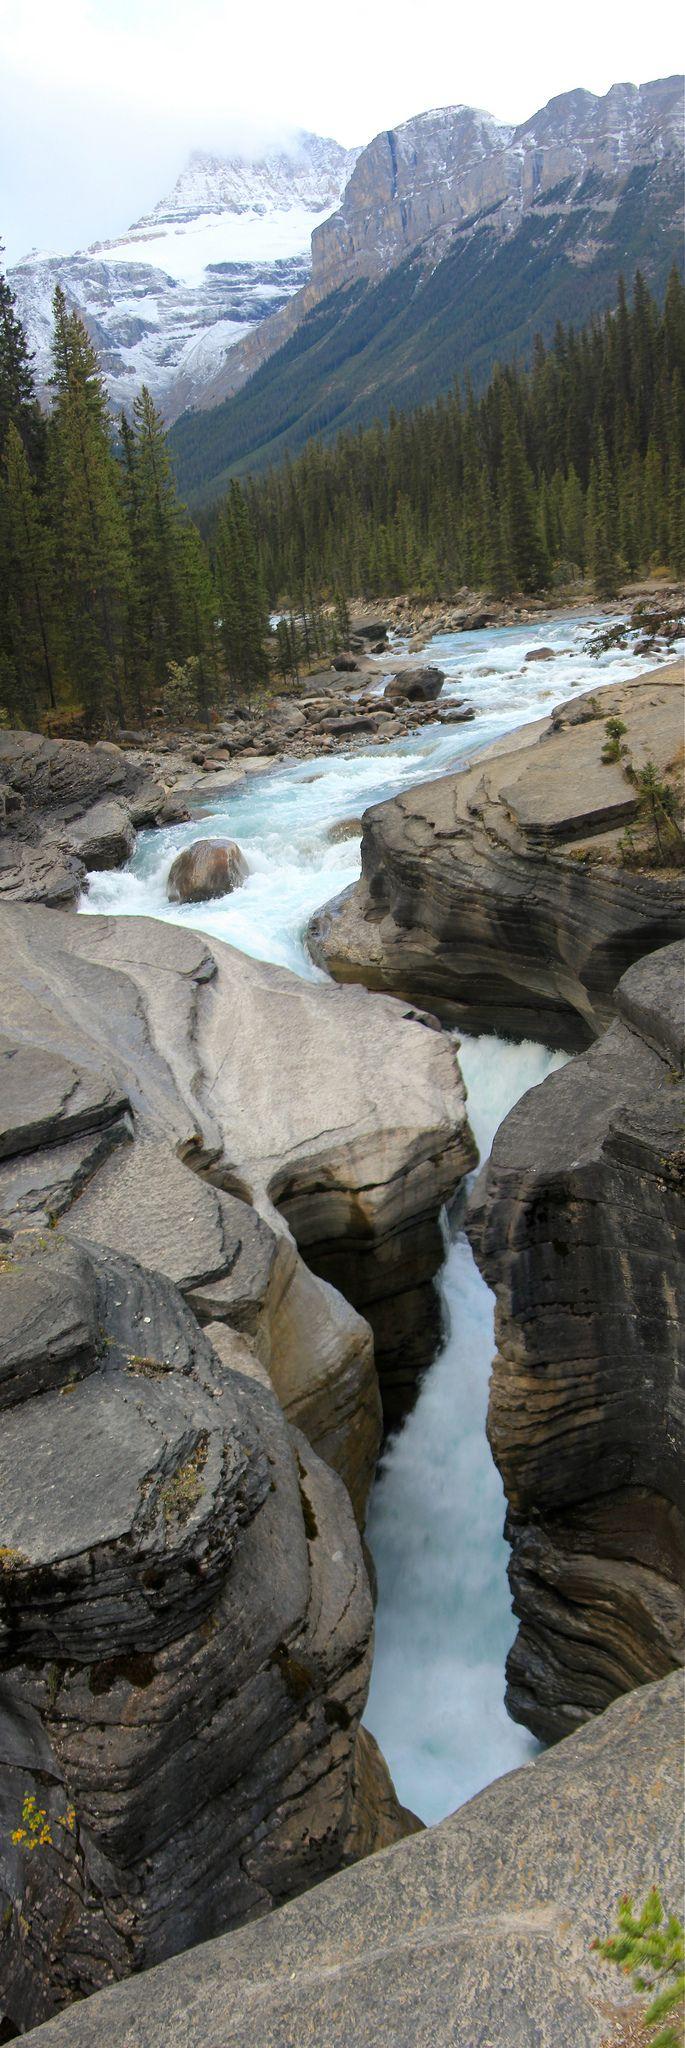 Mistaya Canyon, Banff National Park, Alberta Canada by Alyson Hurt Flickr